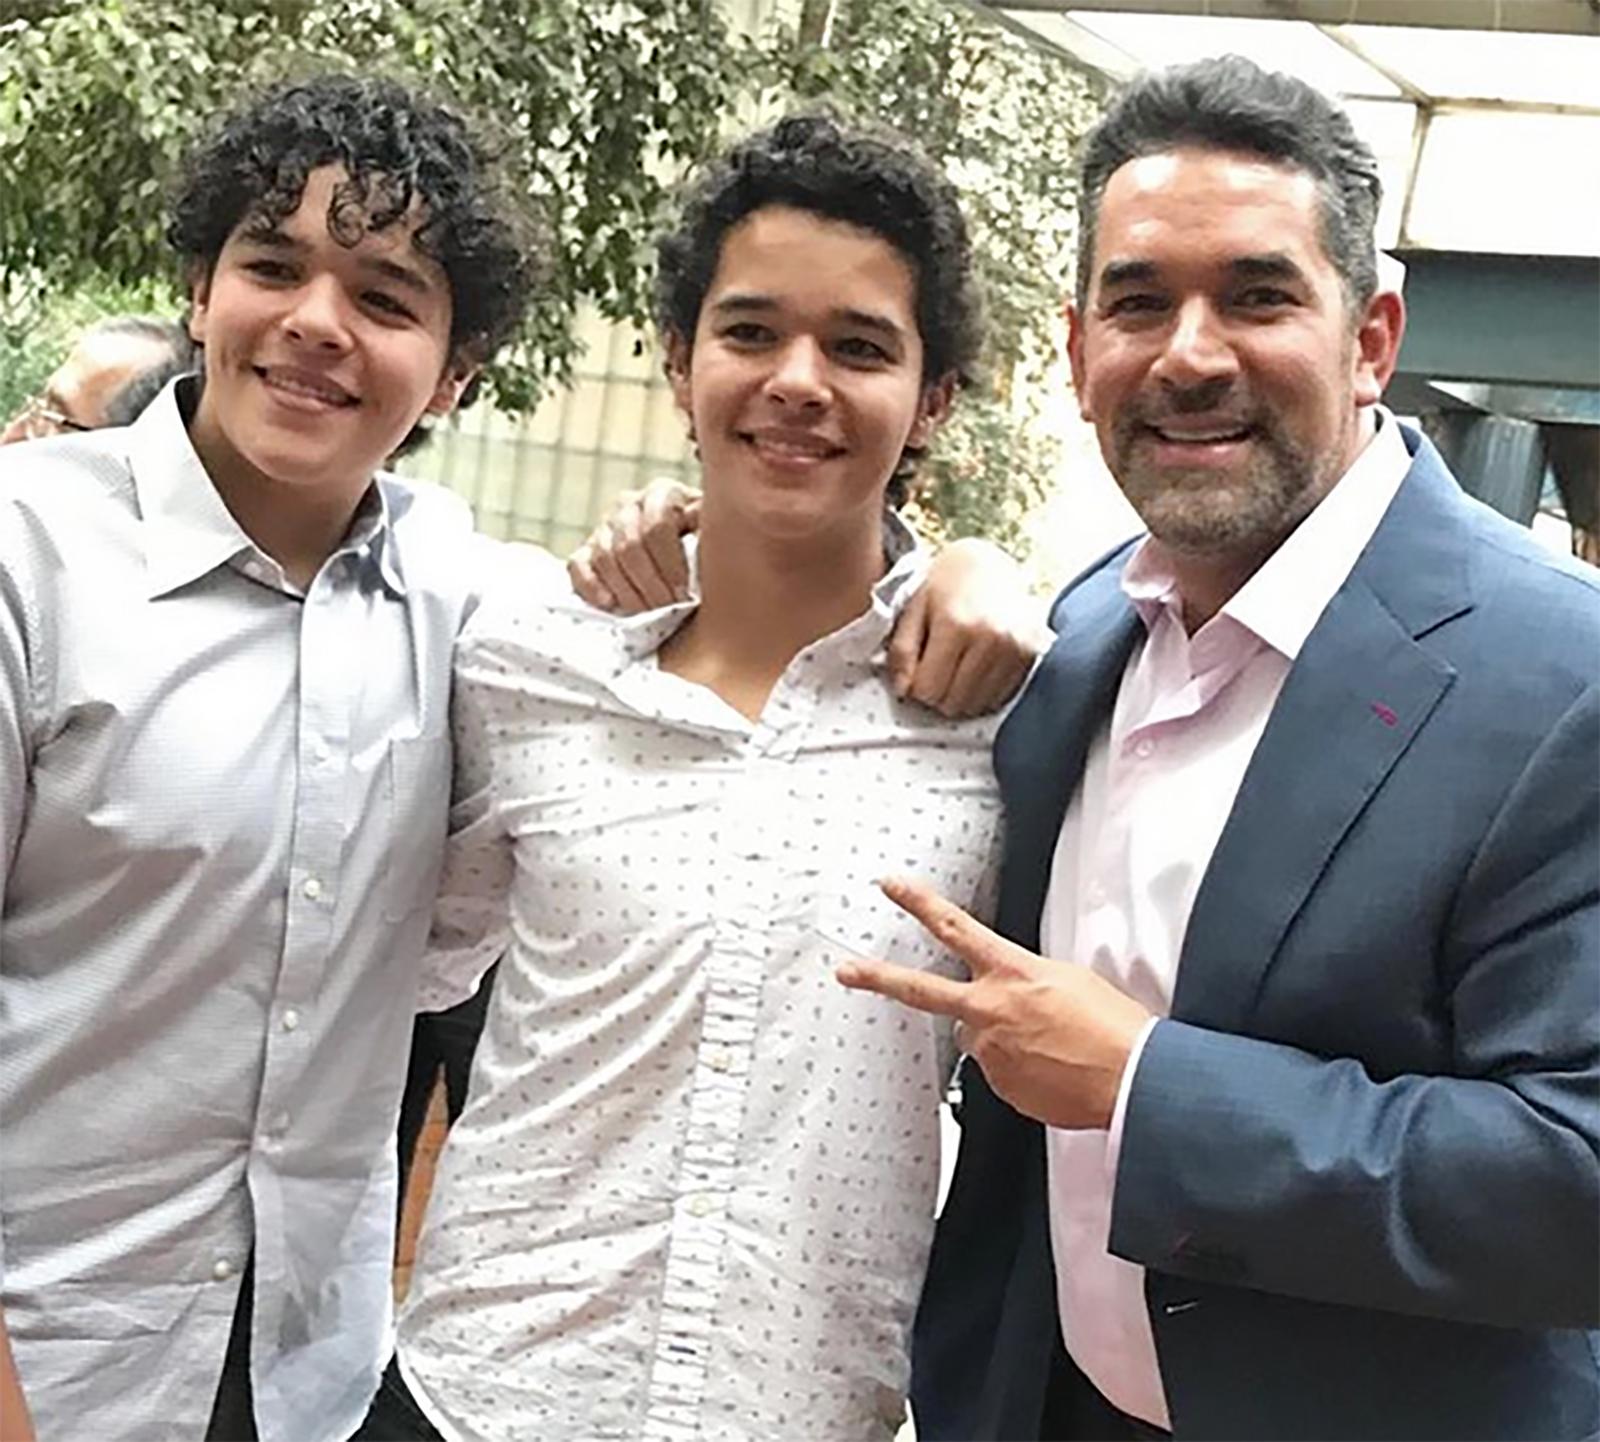 Eduardo Santamarina, José Eduardo Santamarina, Roberto Miguel Santamarina